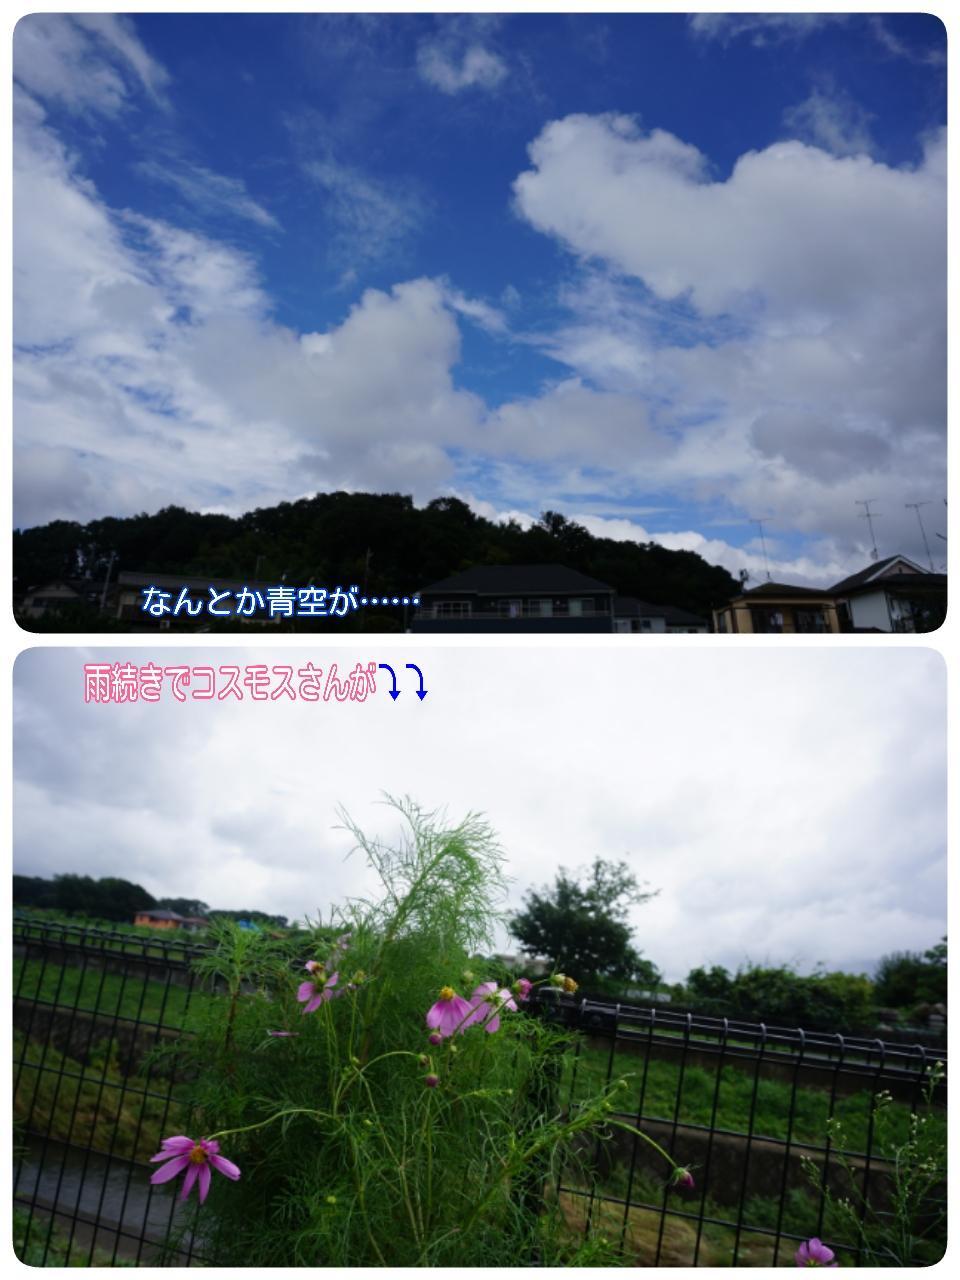 16-08-29-12-50-35-261_deco.jpg